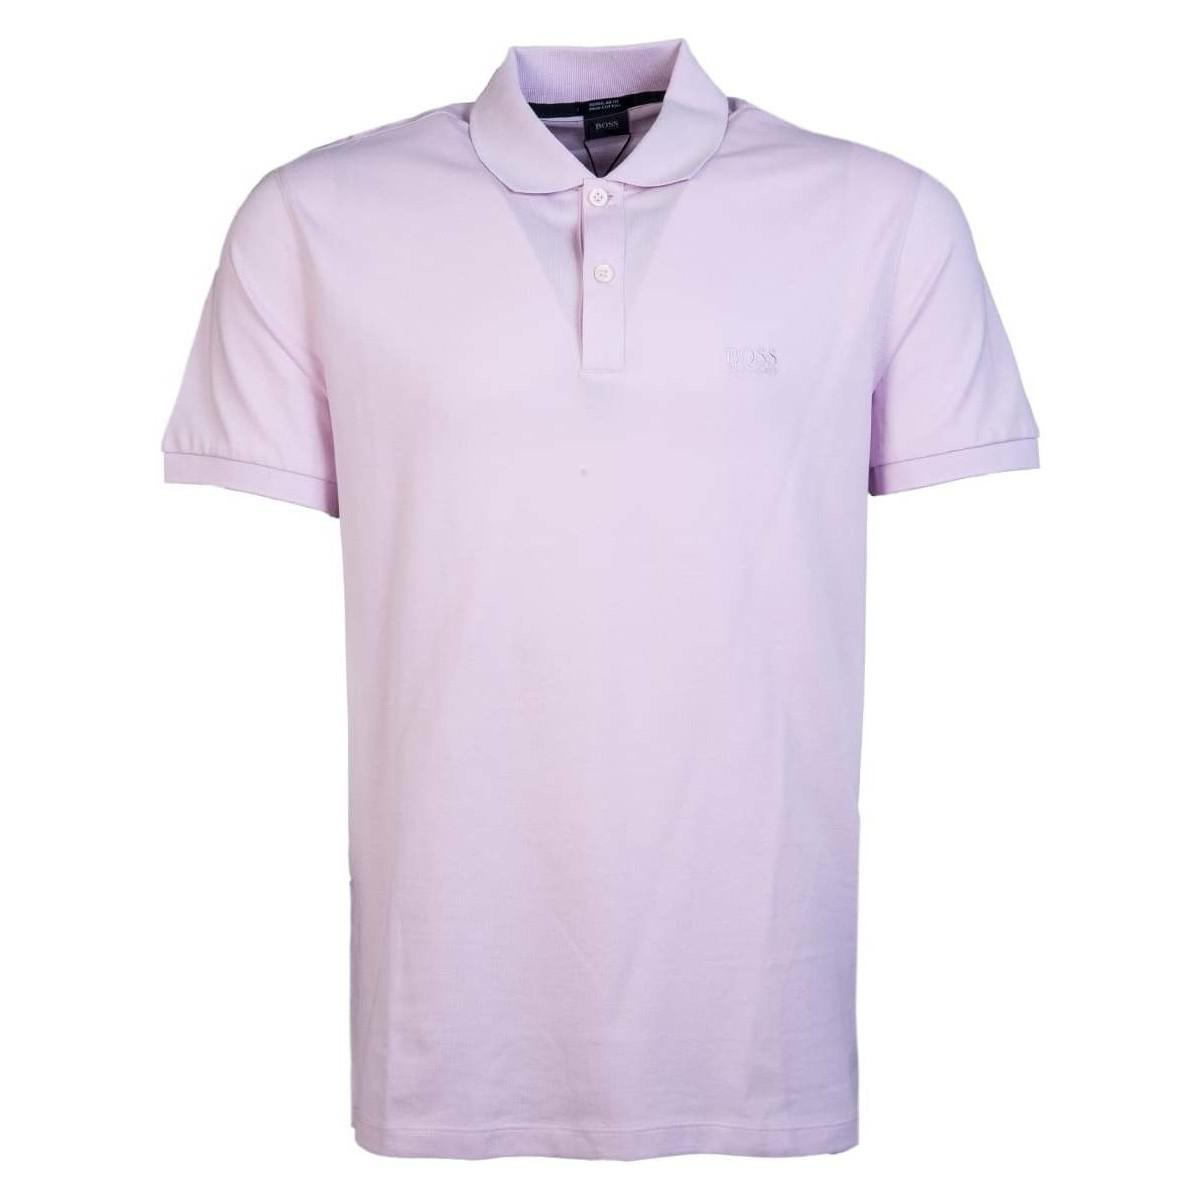 12ed1f9e BOSS Mens Urban T-Shirt R_n Pyjama Top 50396940 Clothing